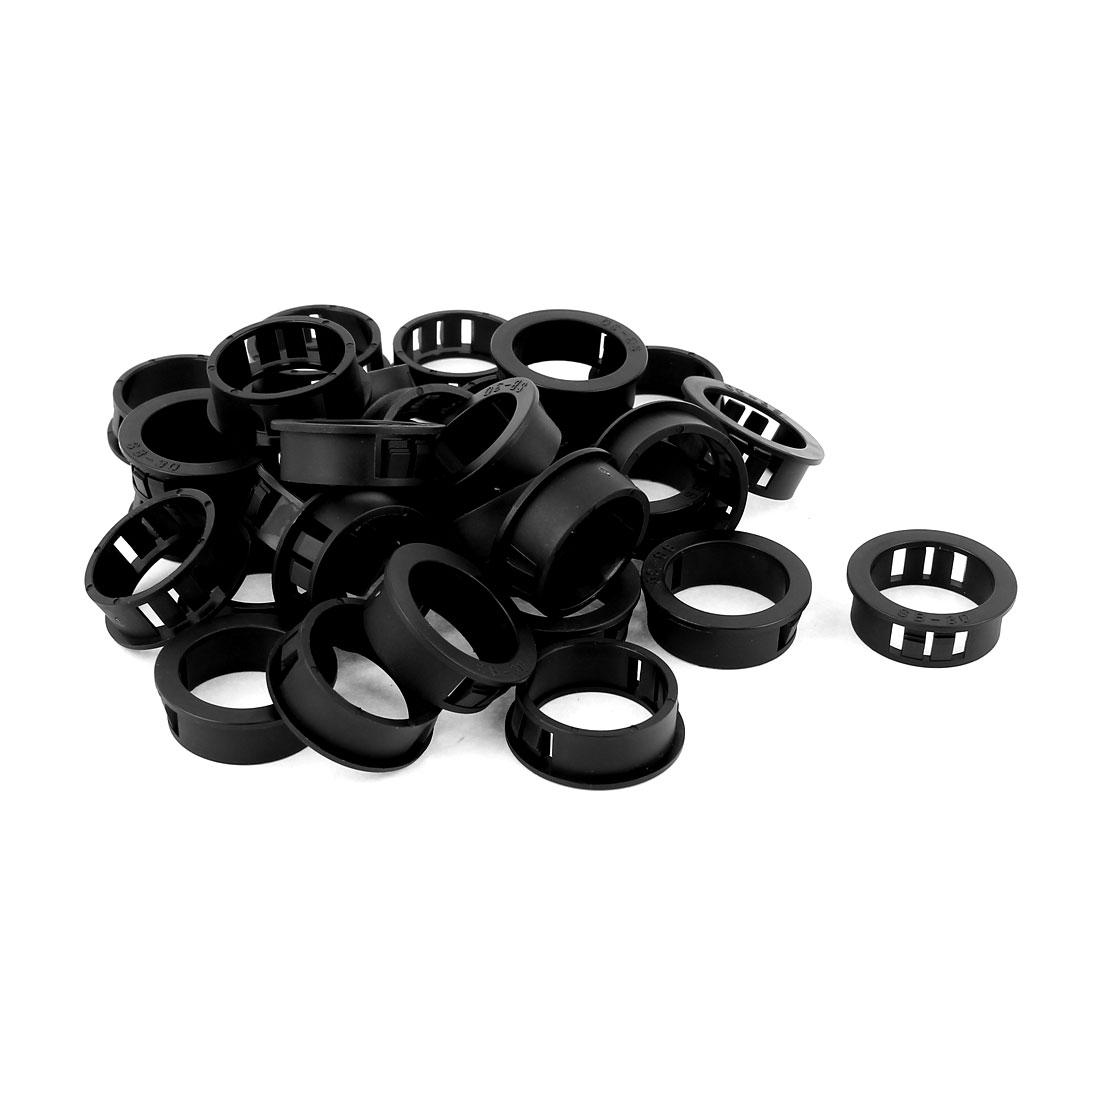 Plastic 30mm Cable Hose Snap Locking Bushing Protective Grommet 30Pcs Black